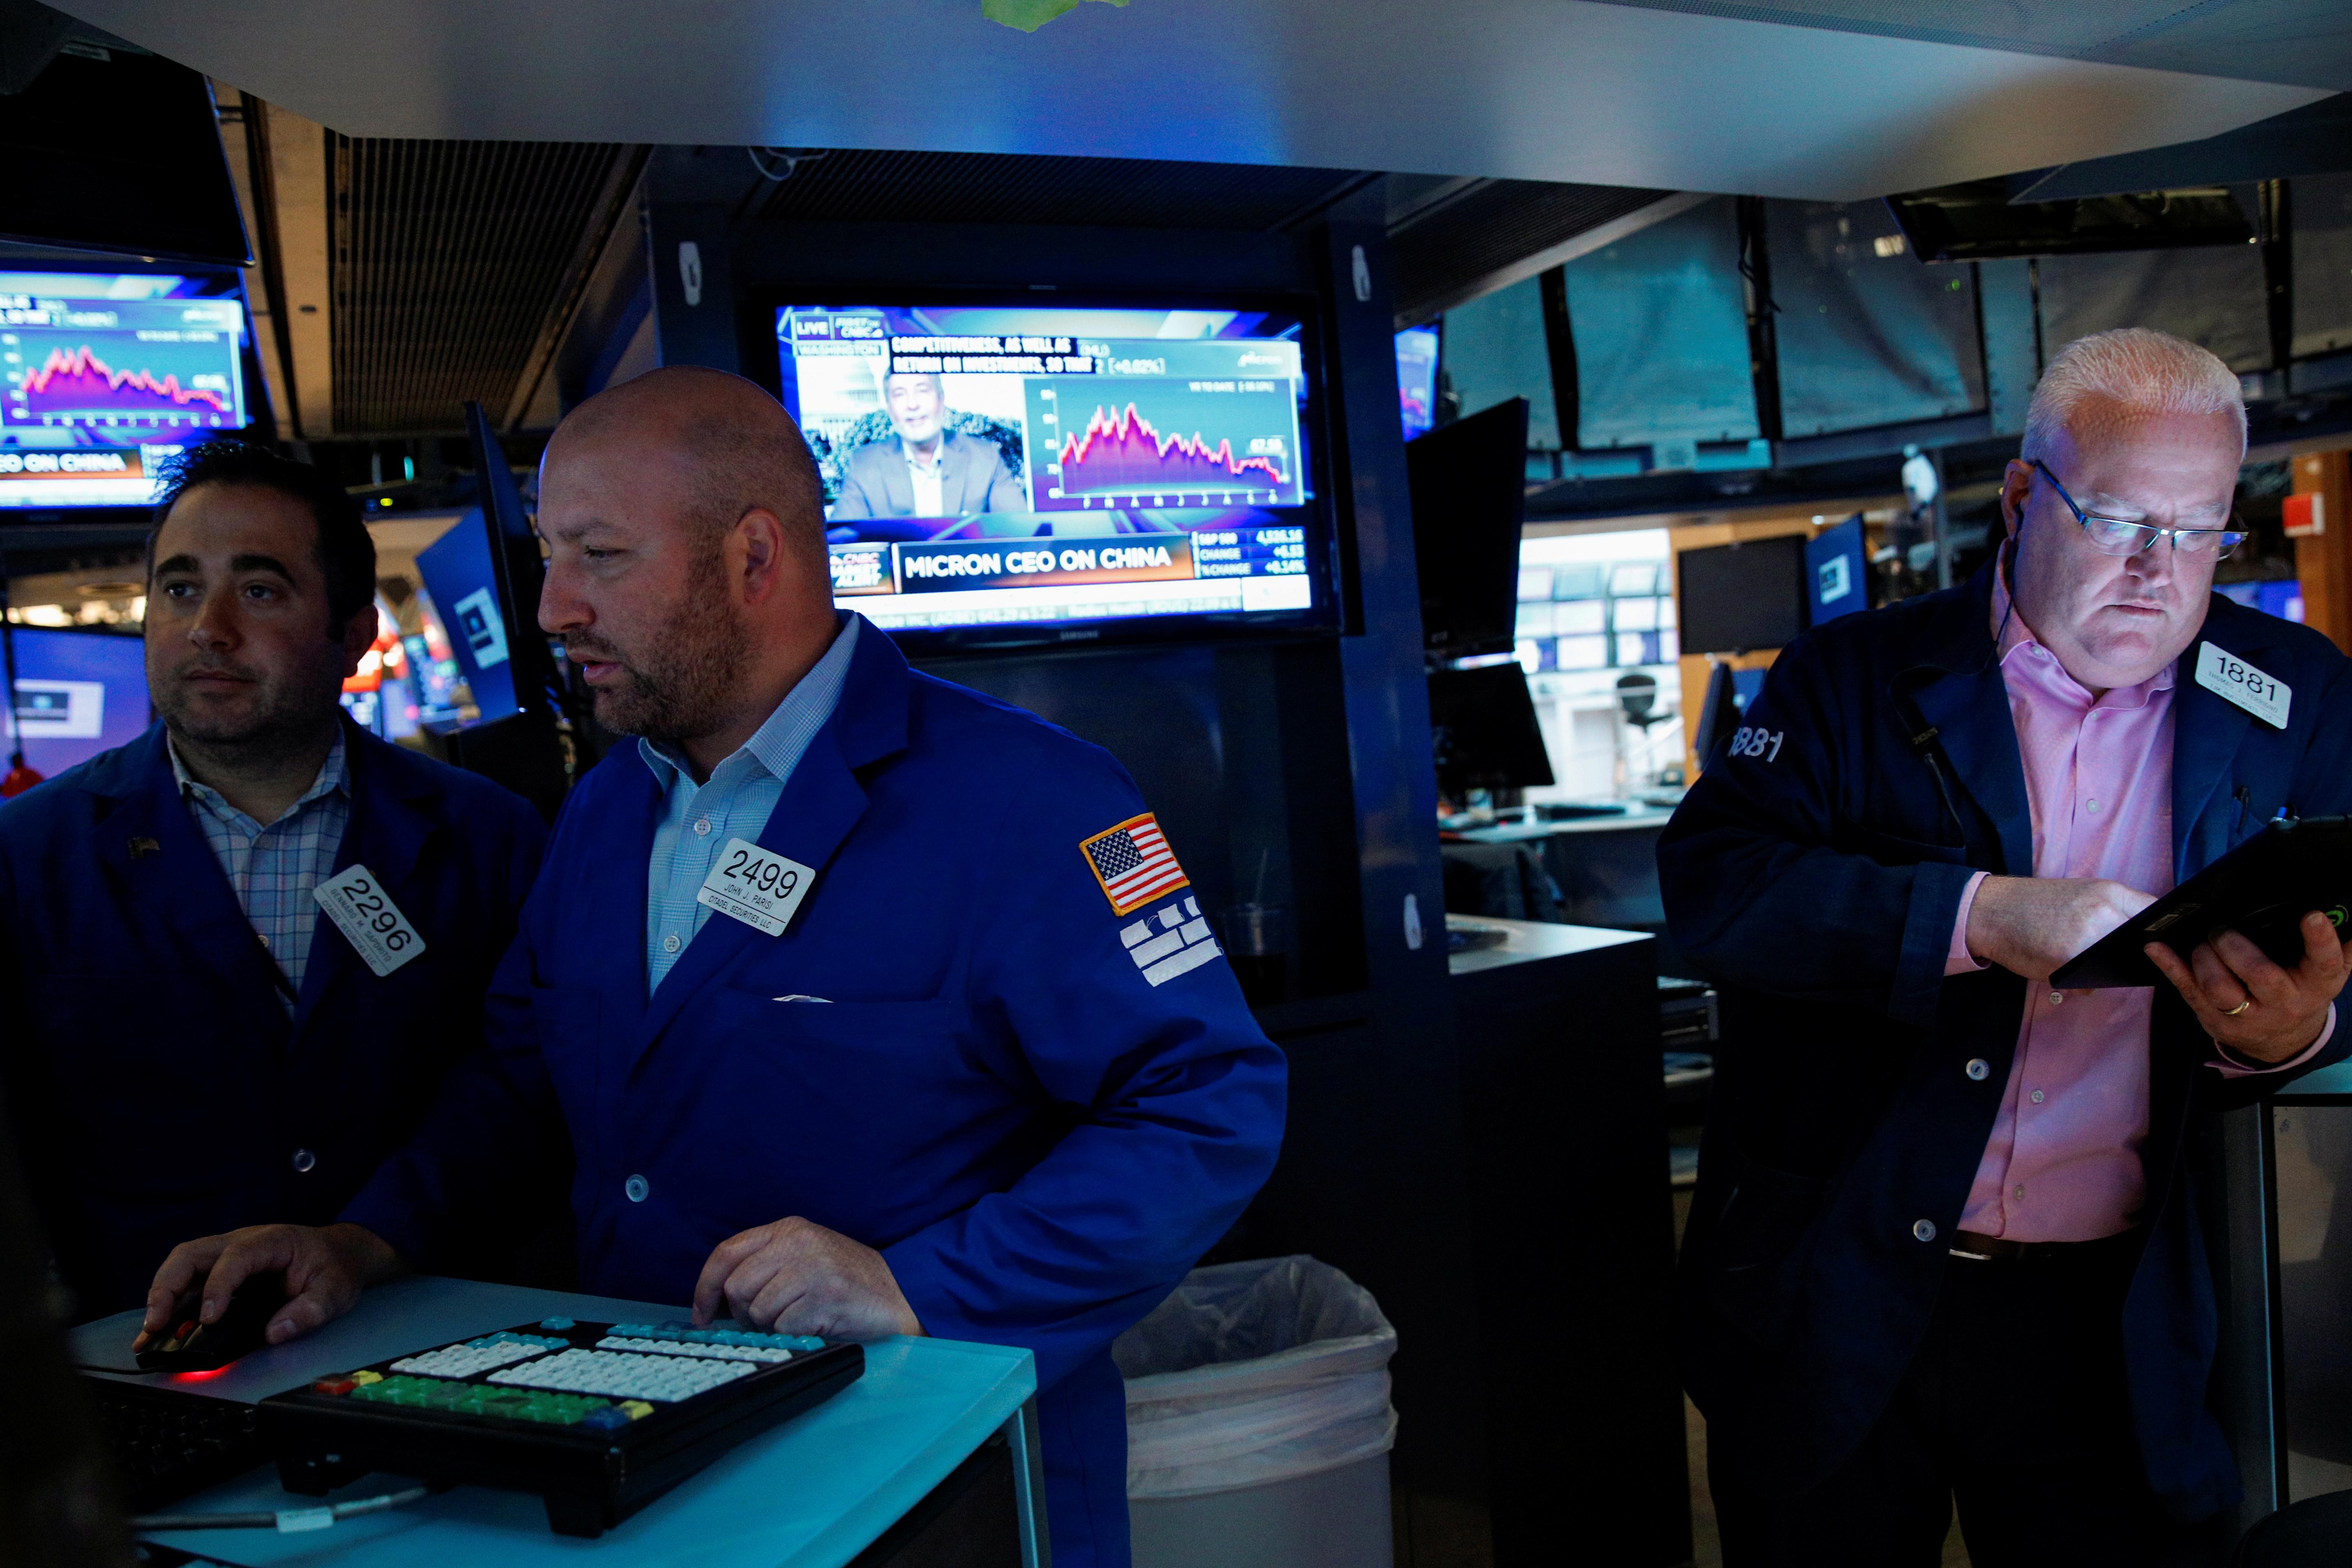 Stock market news live updates: Stocks edge lower ahead of technology earnings